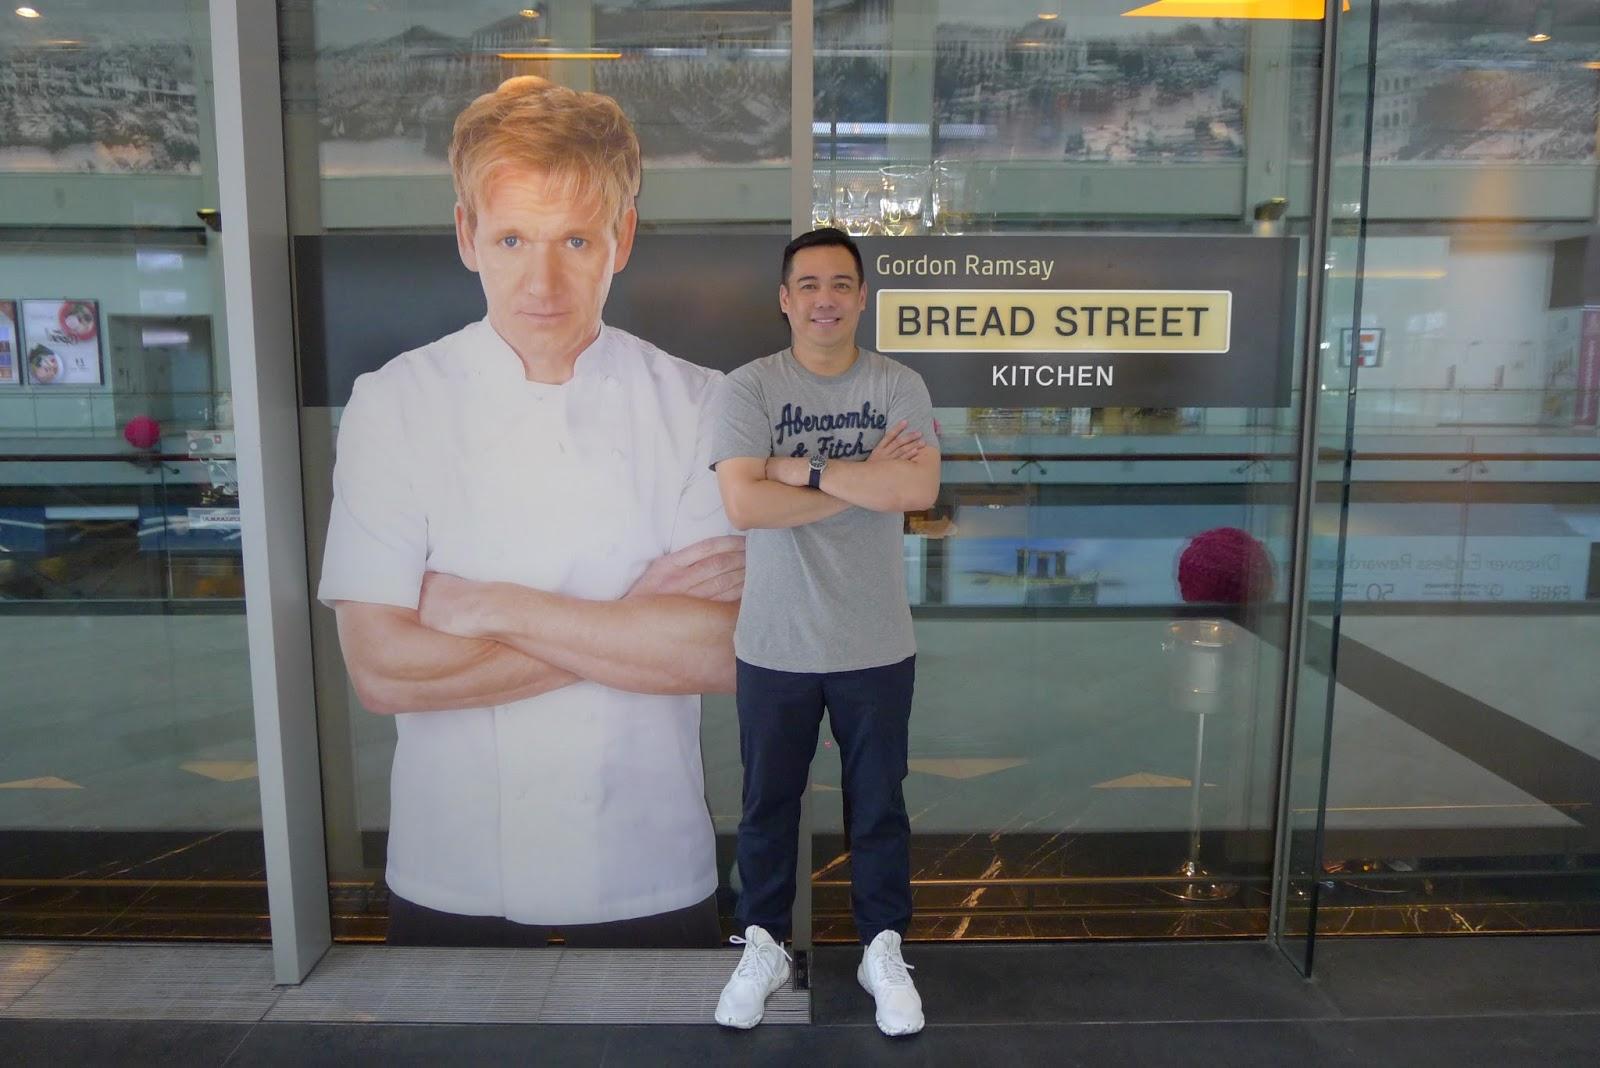 Bread Street Kitchen Singapore By Gordon Ramsay Tina Villa